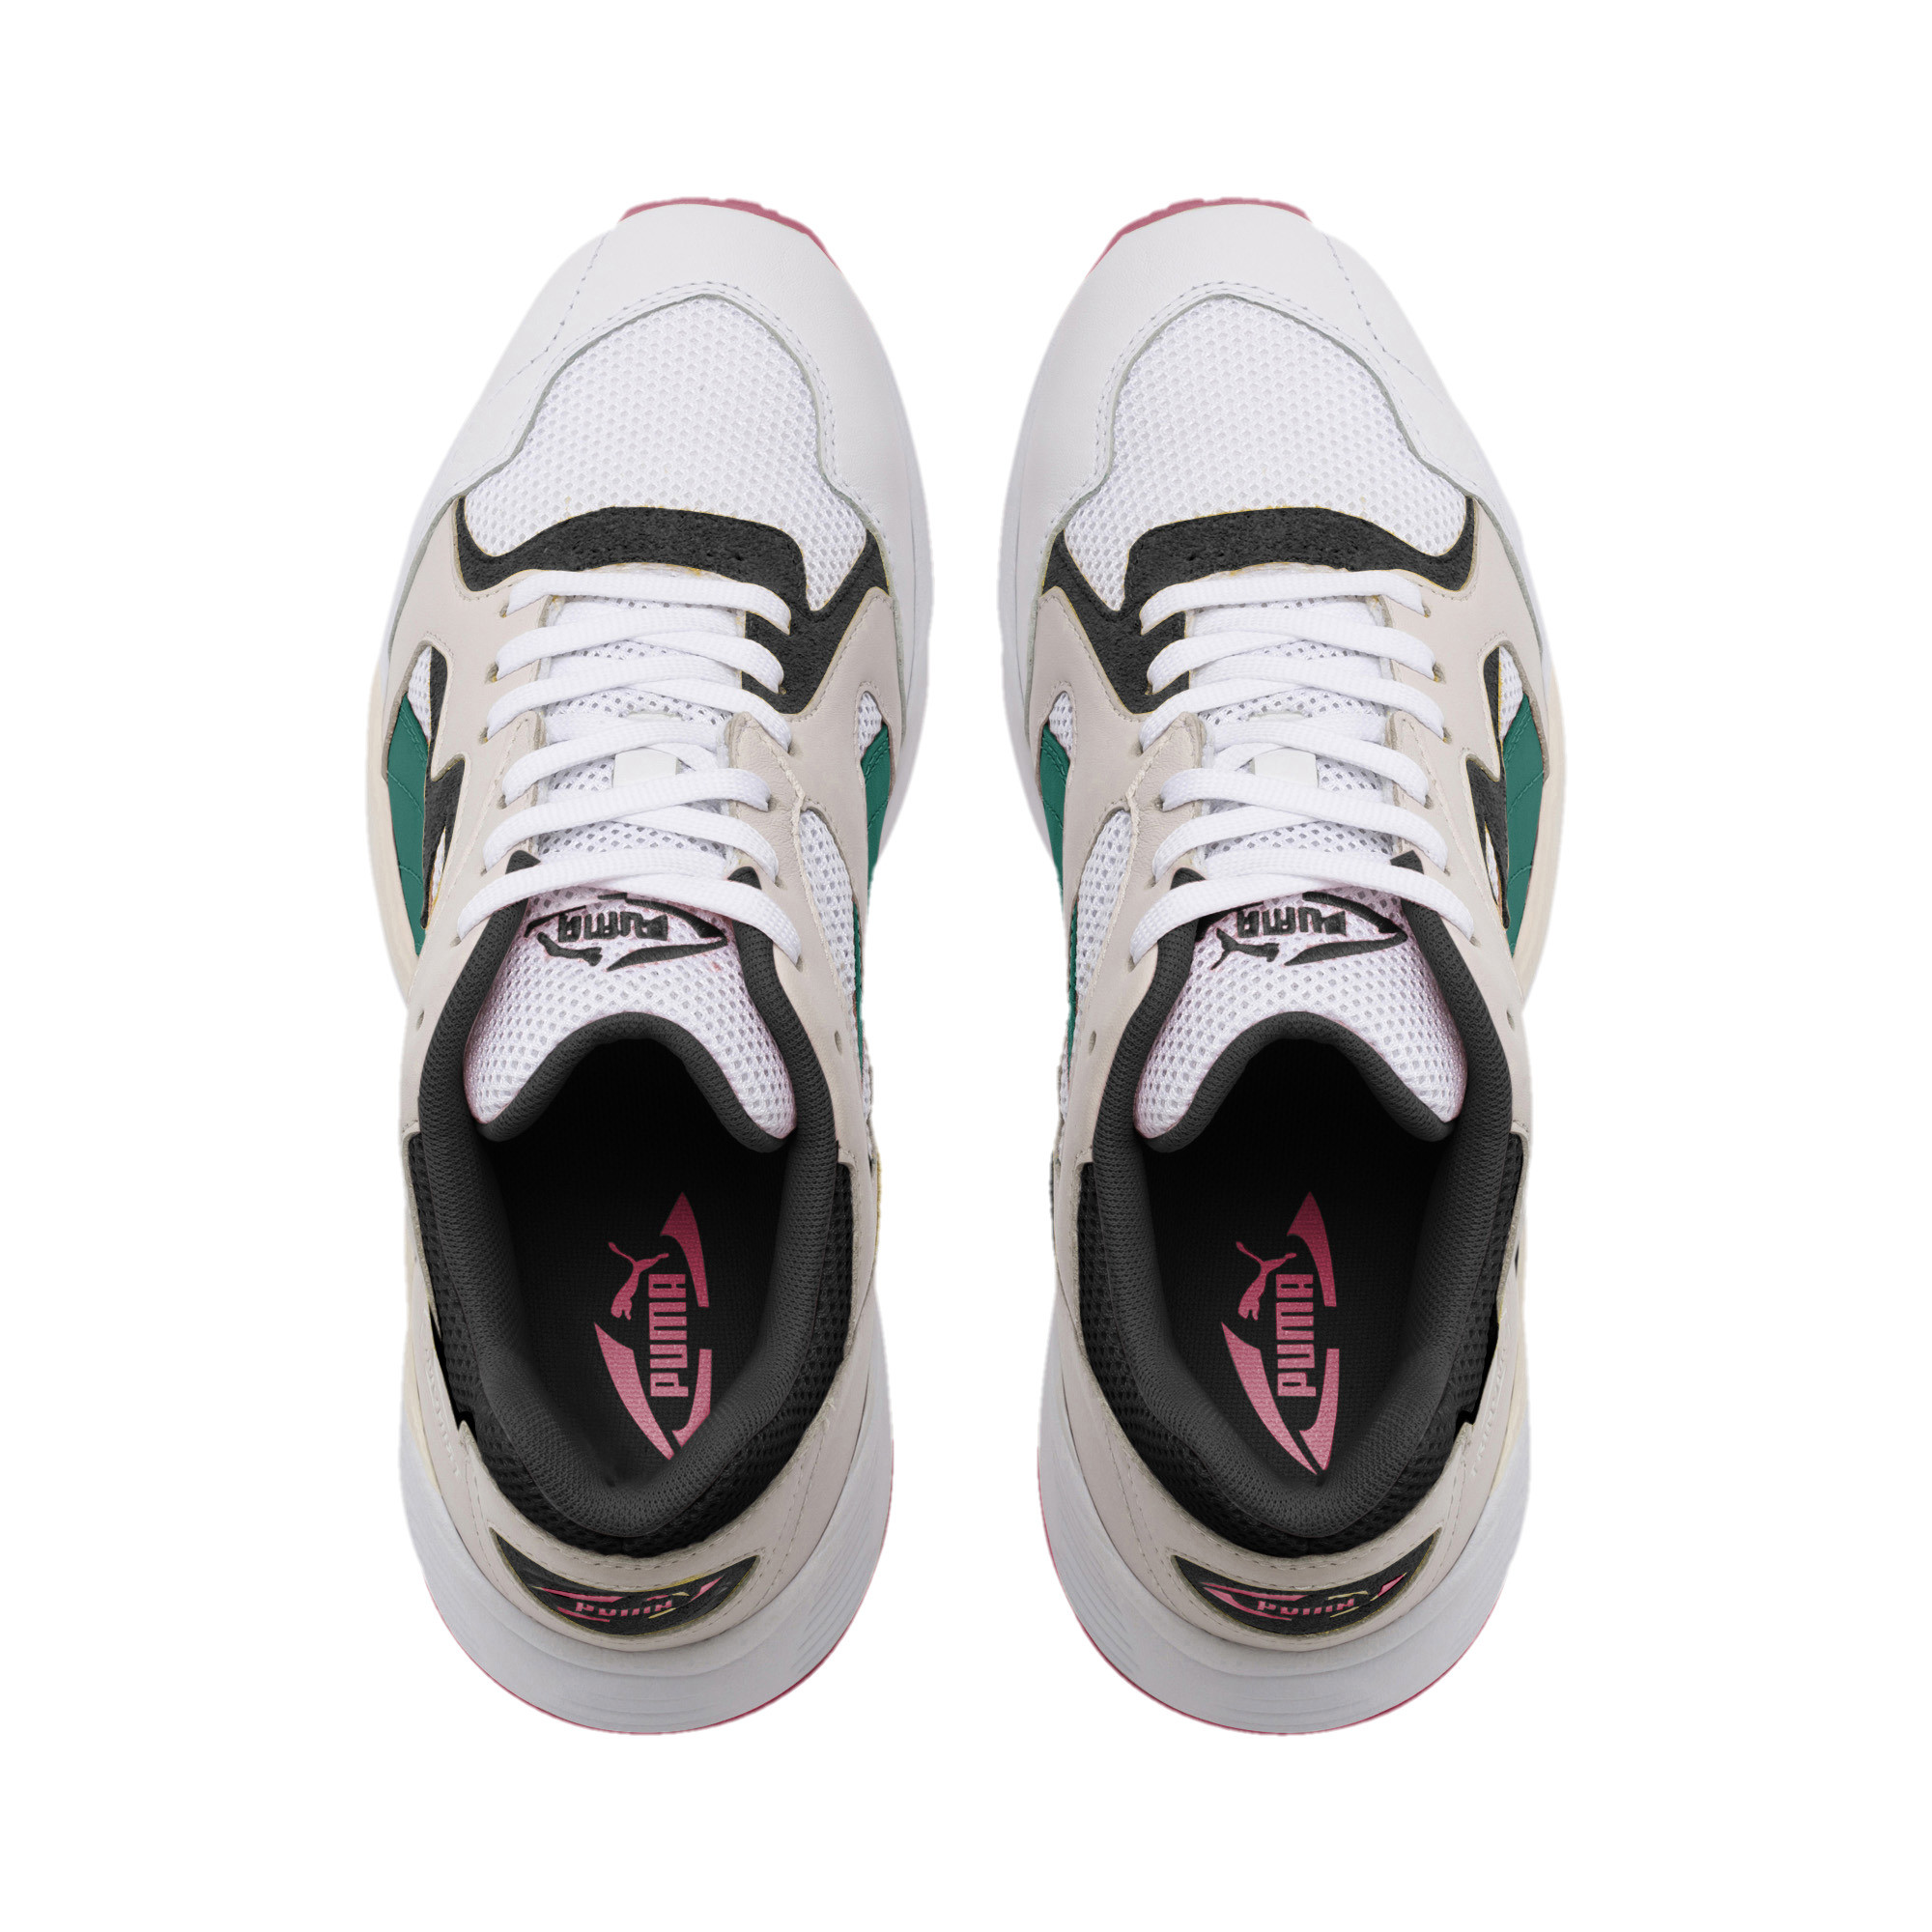 PUMA-Prevail-Classic-Sneakers-Unisex-Shoe thumbnail 13